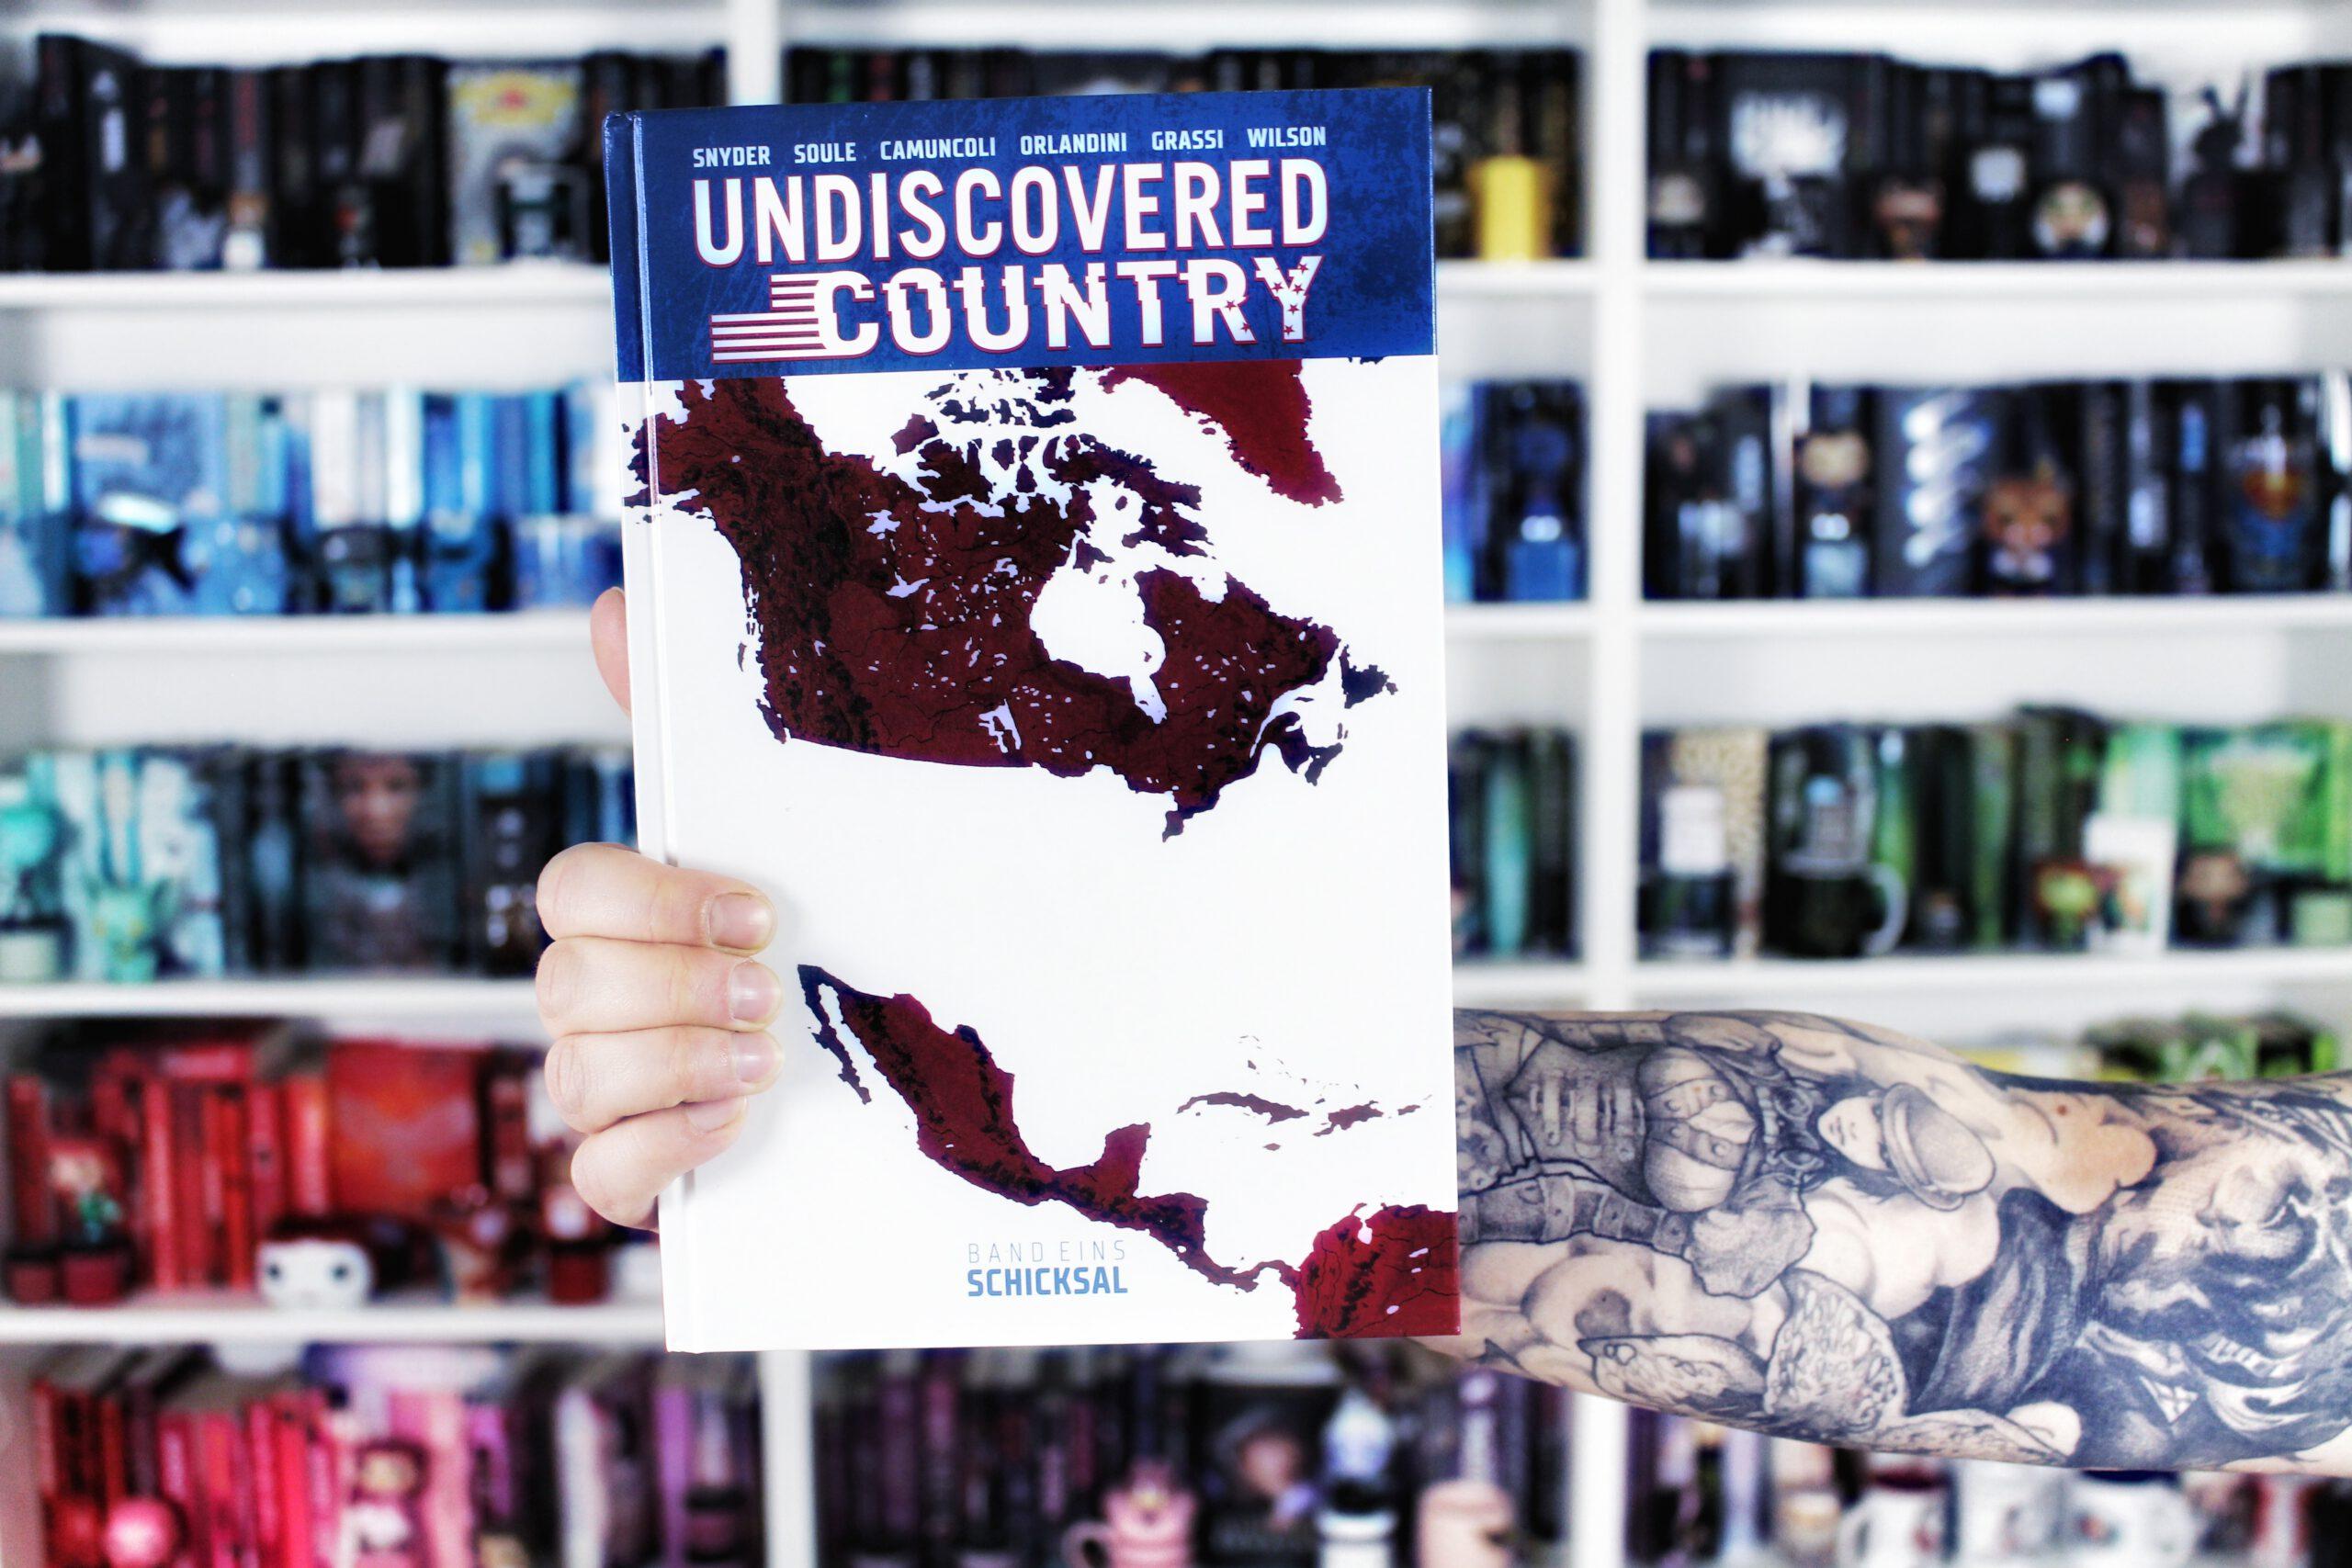 Rezension | Undiscovered Country 1: Schicksal